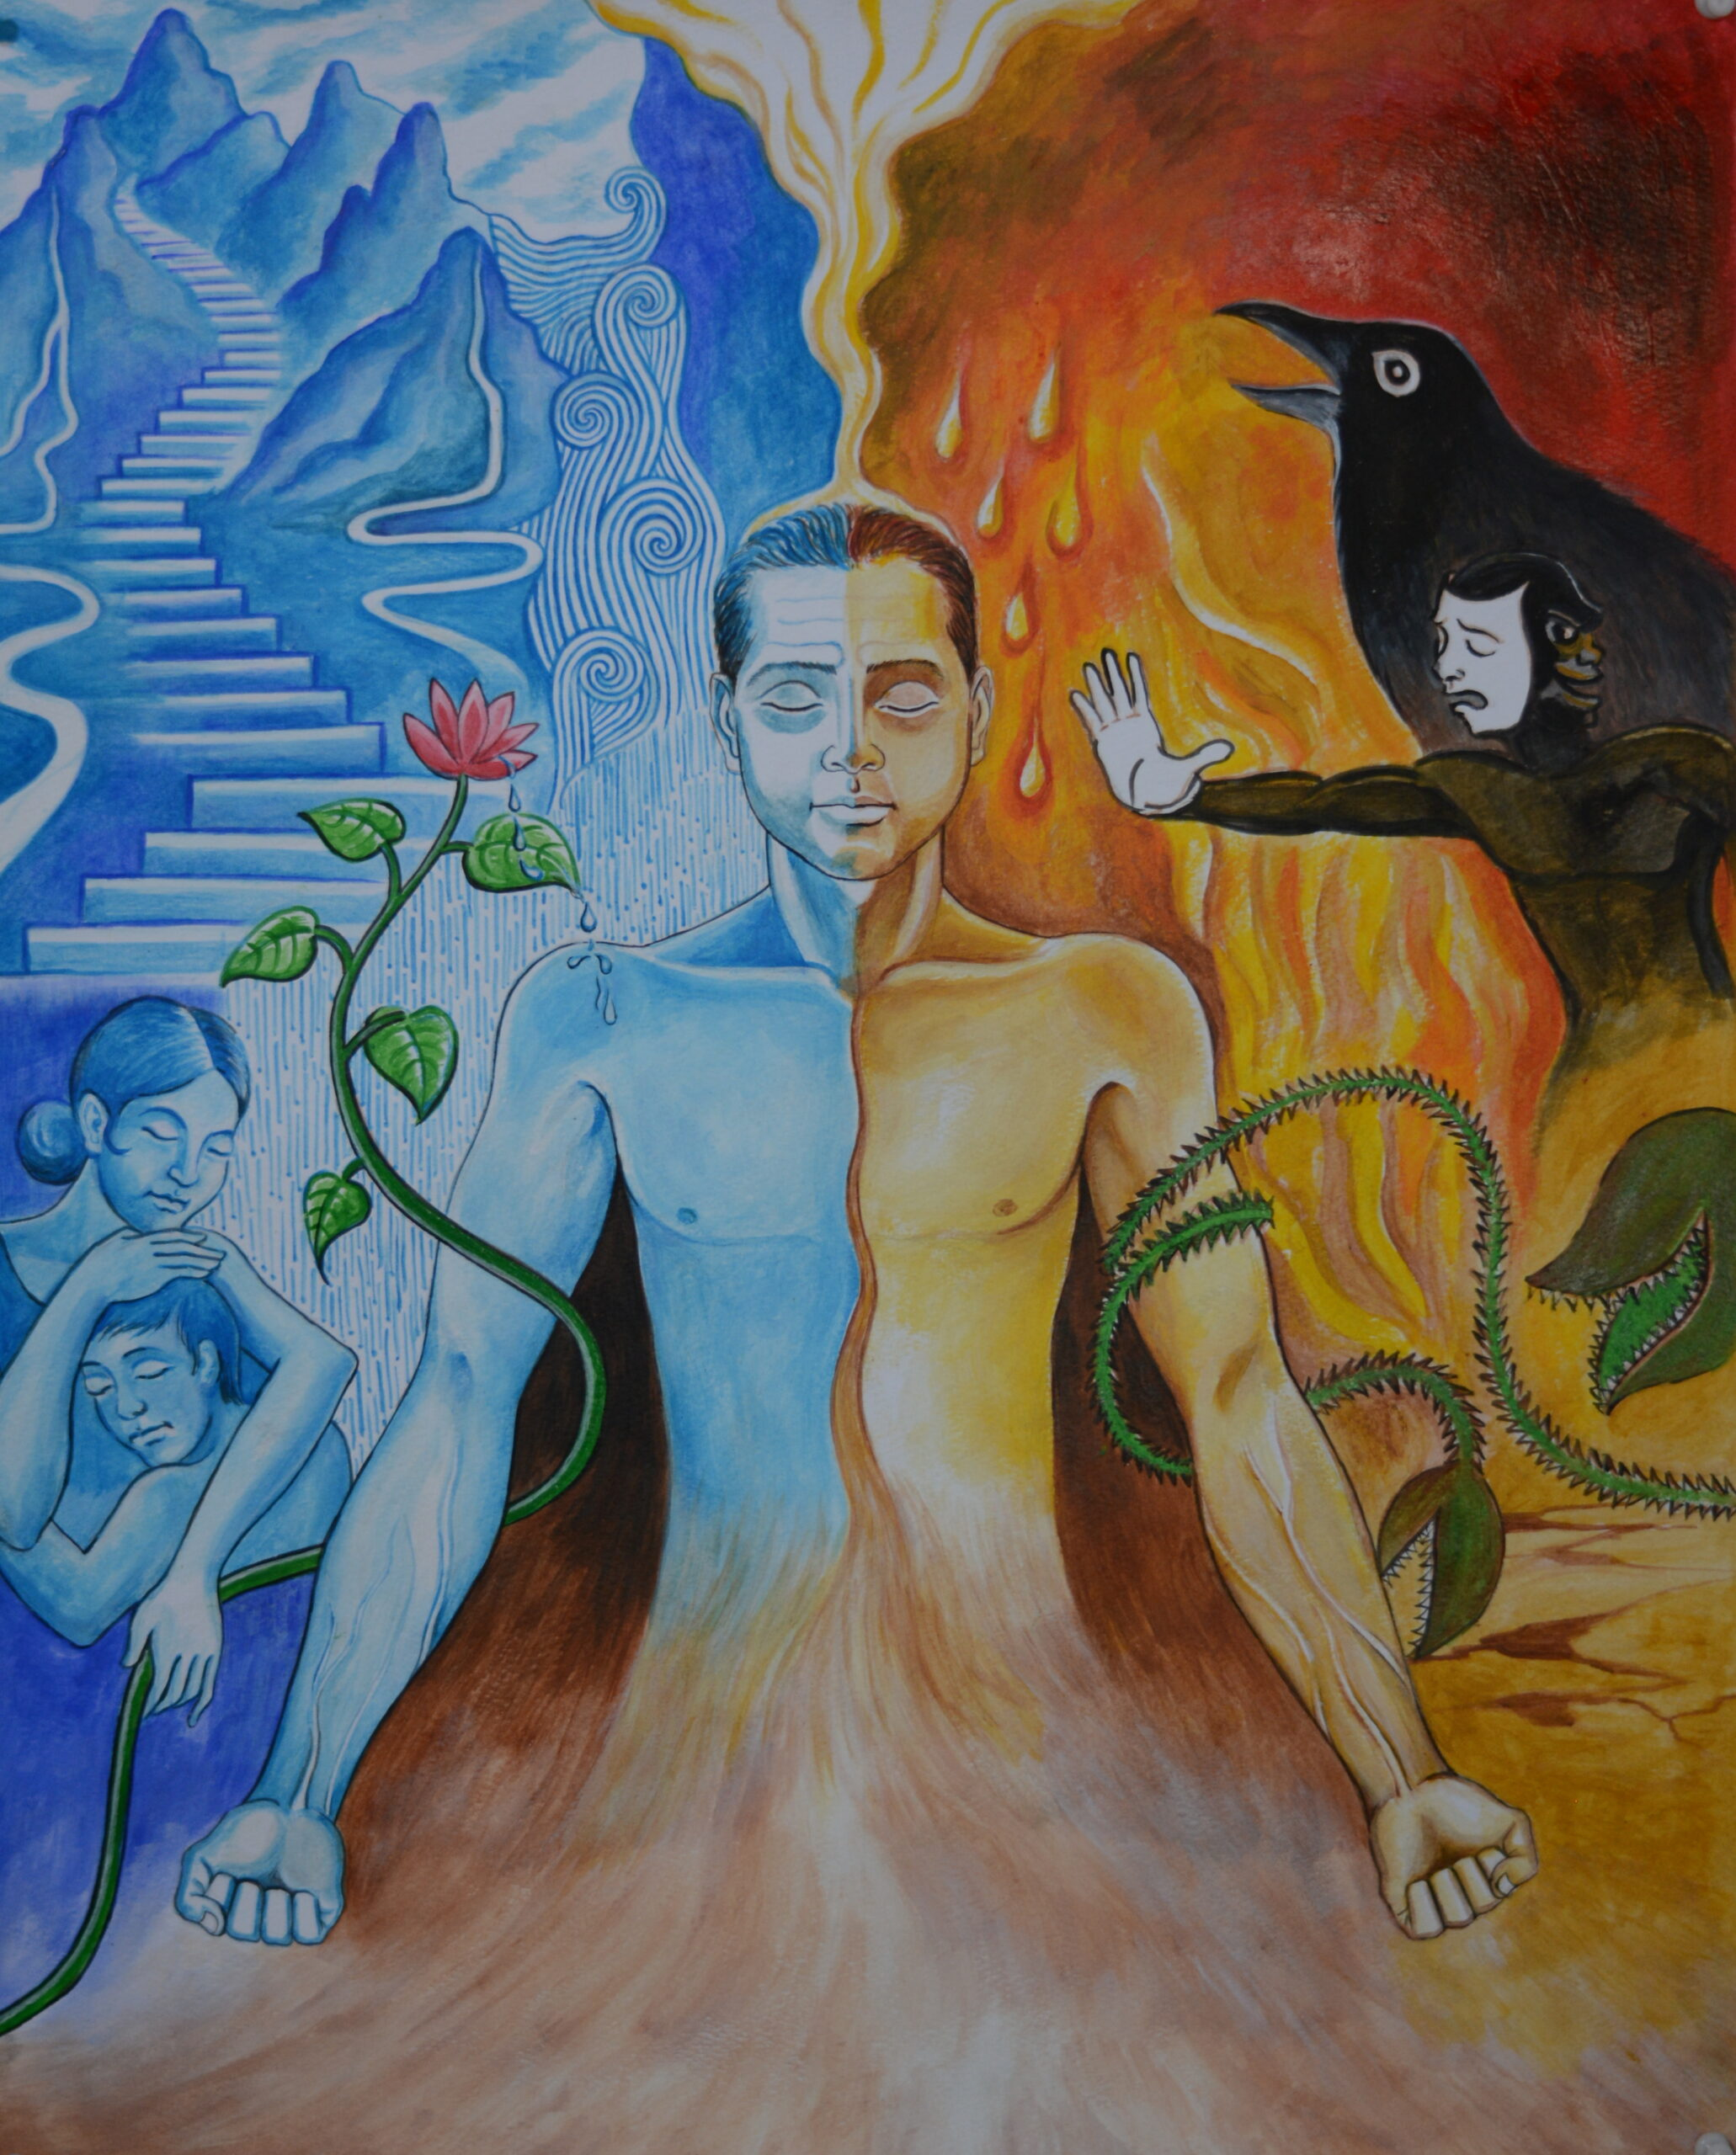 Facing the death_J. M. Pramuditha Anuruddha Fernando